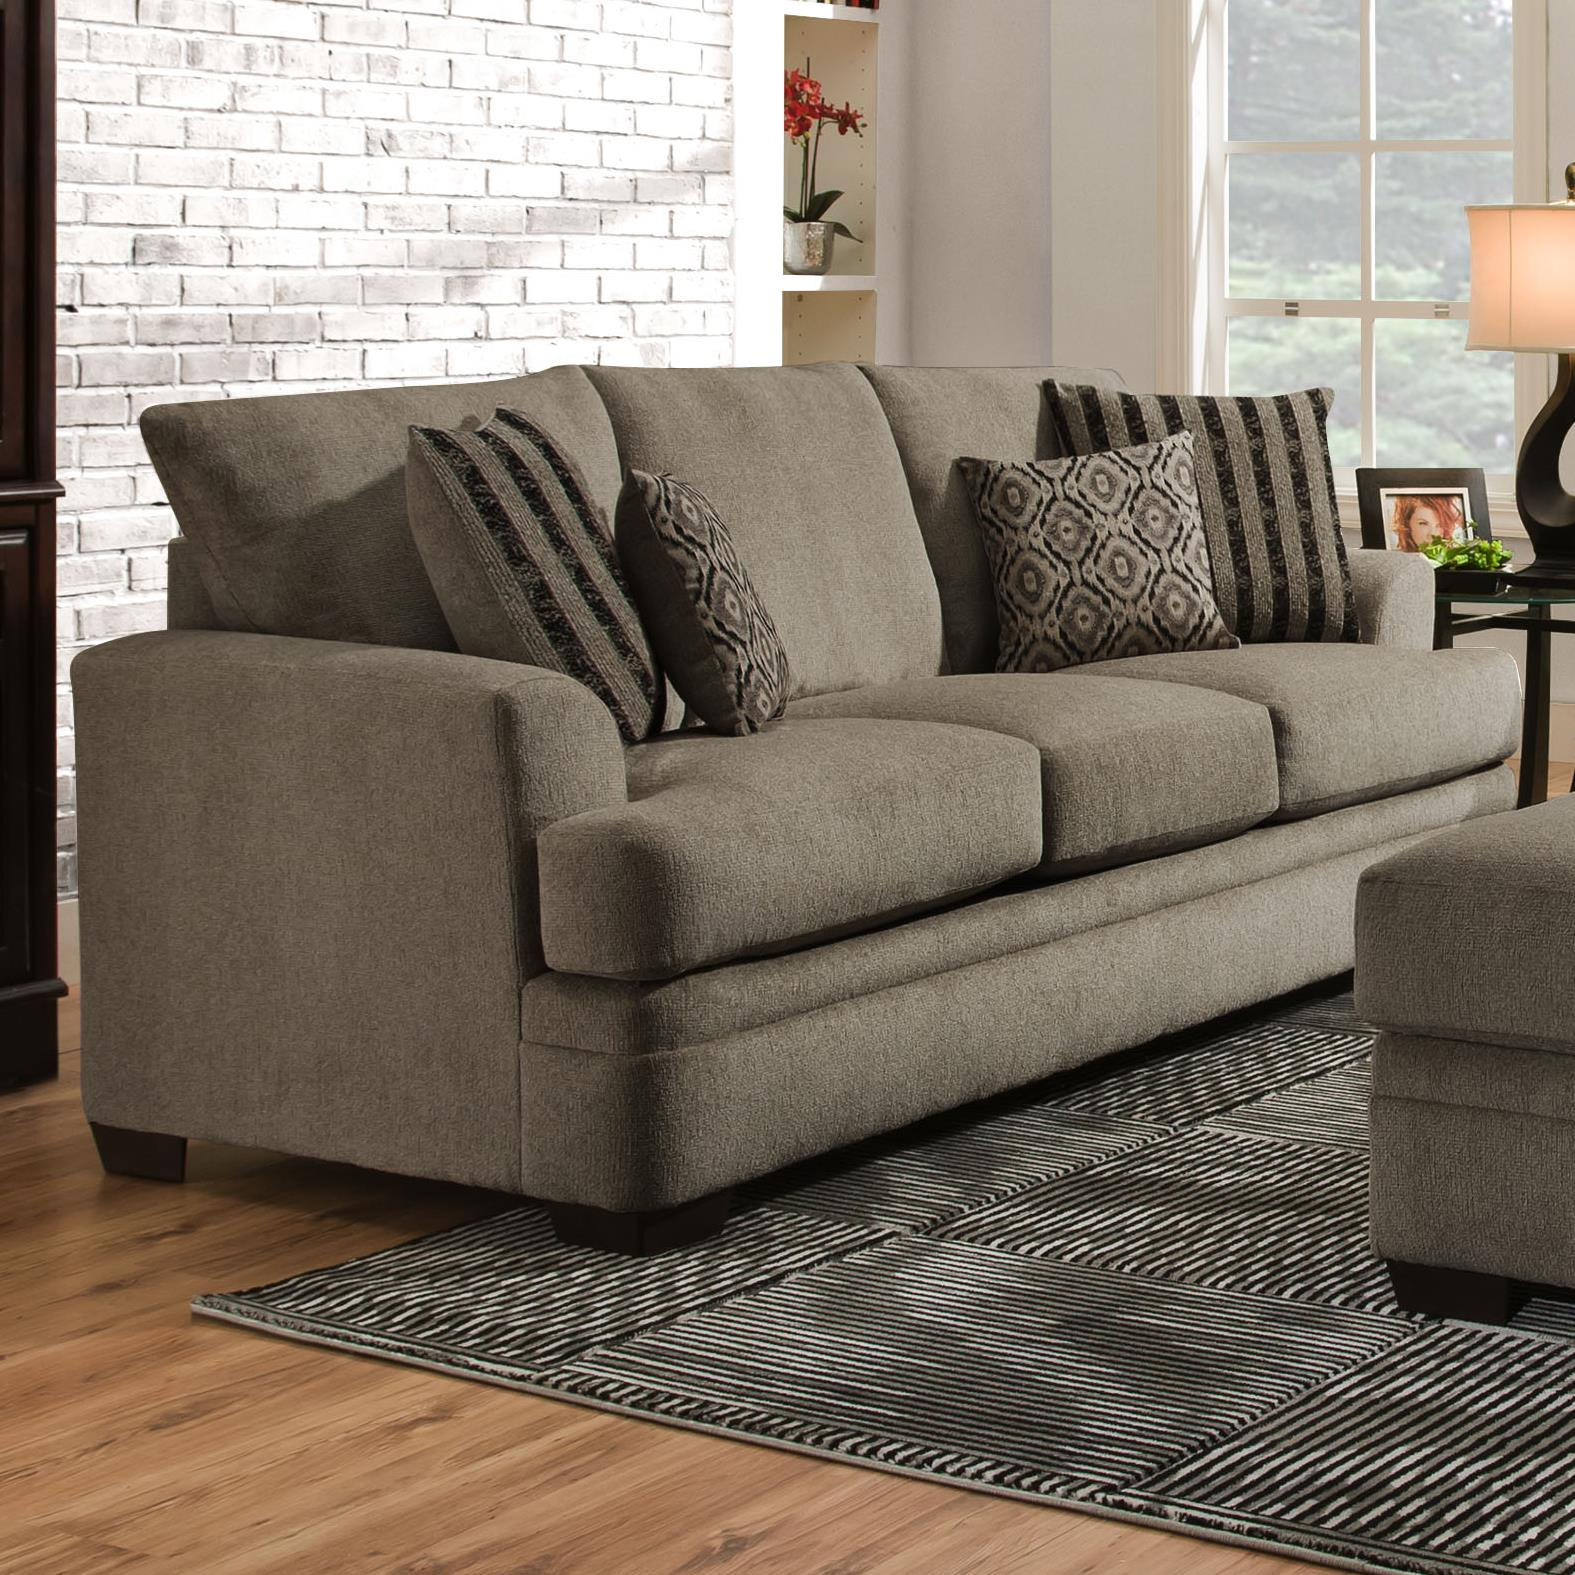 American Furniture 3650 Queen Sofa Sleeper   Item Number: 3658 1664